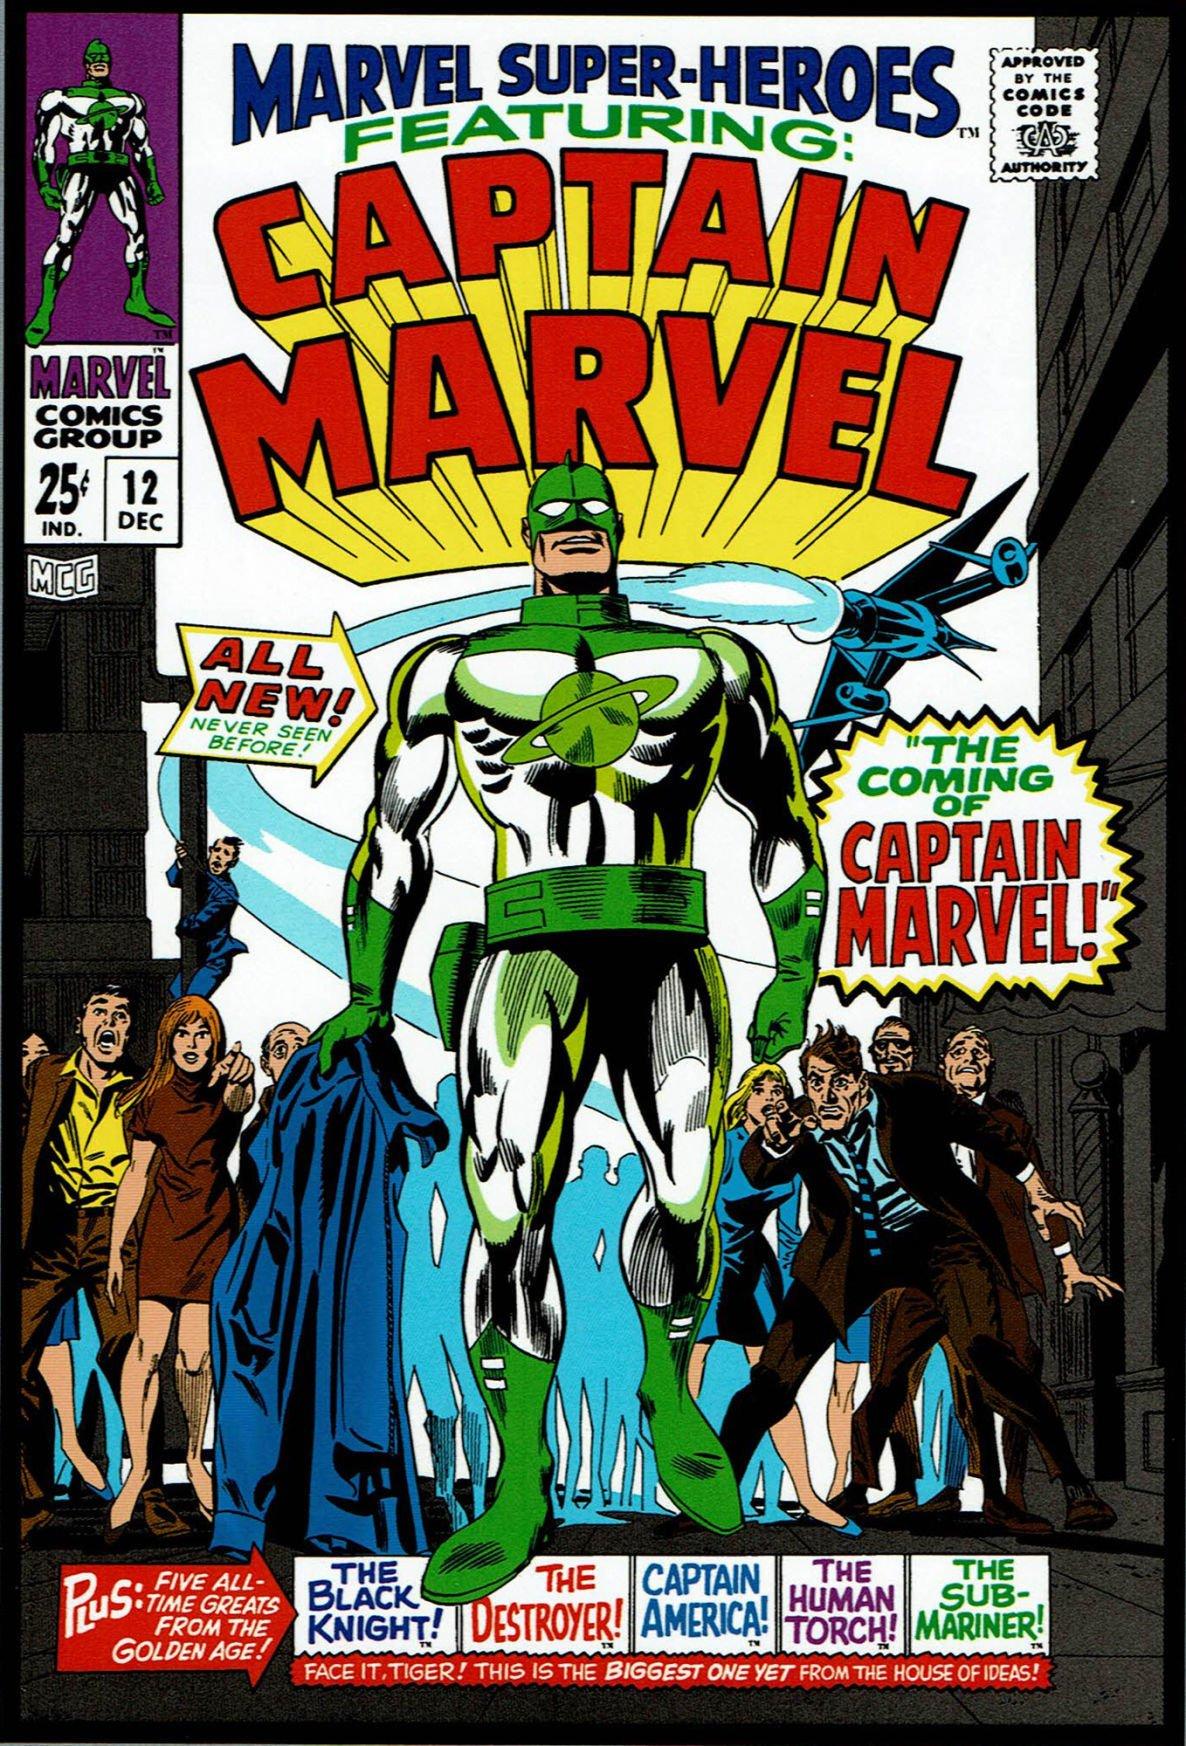 Carol Danvers Ms Marvel Captain Marvel Movie Poster A5